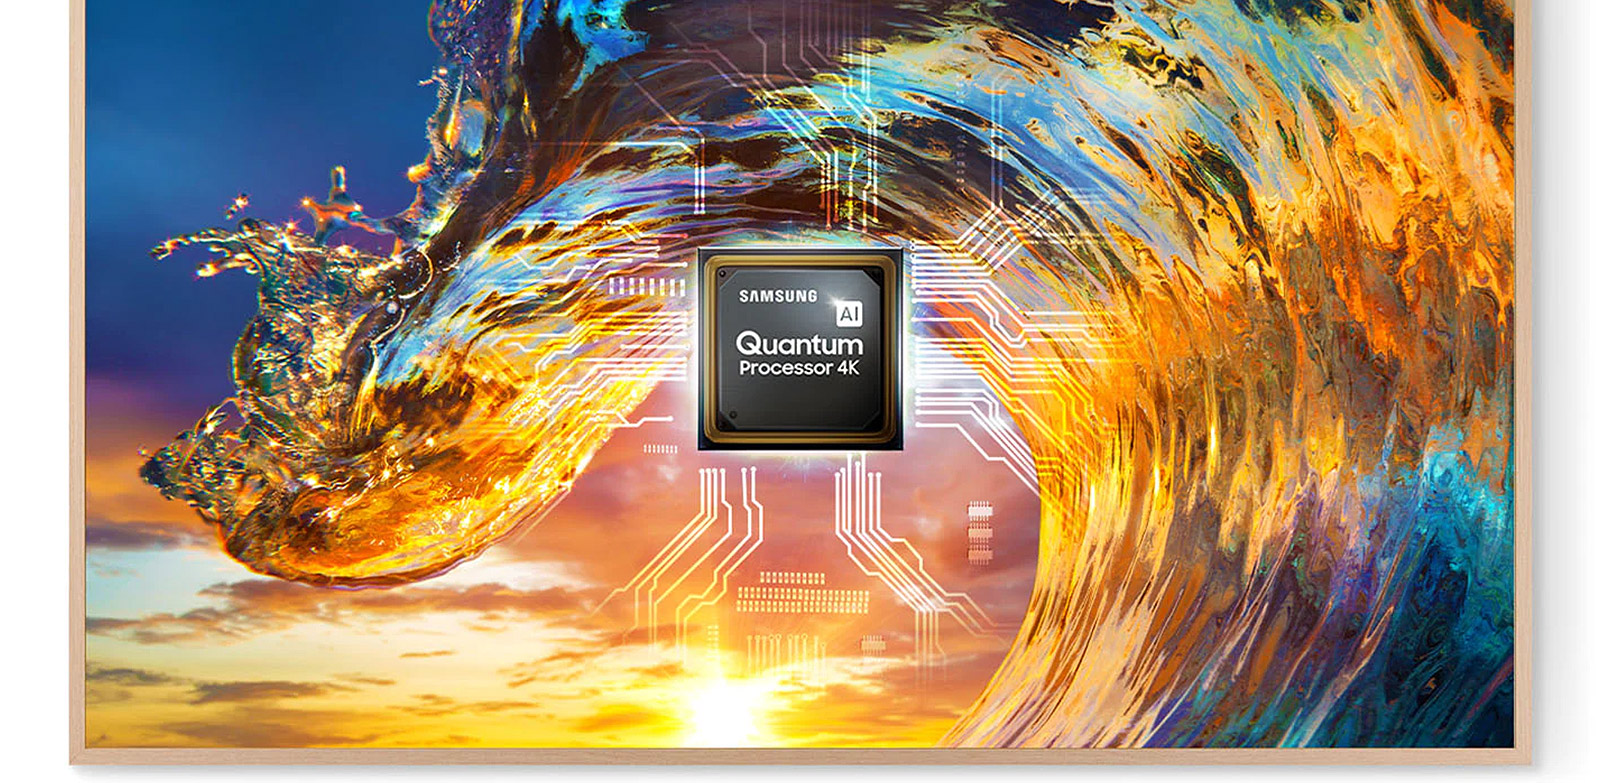 It starts with a next-level, 4K AI processor - Quantum Processor 4K-Extension-Images_appliance_Modular